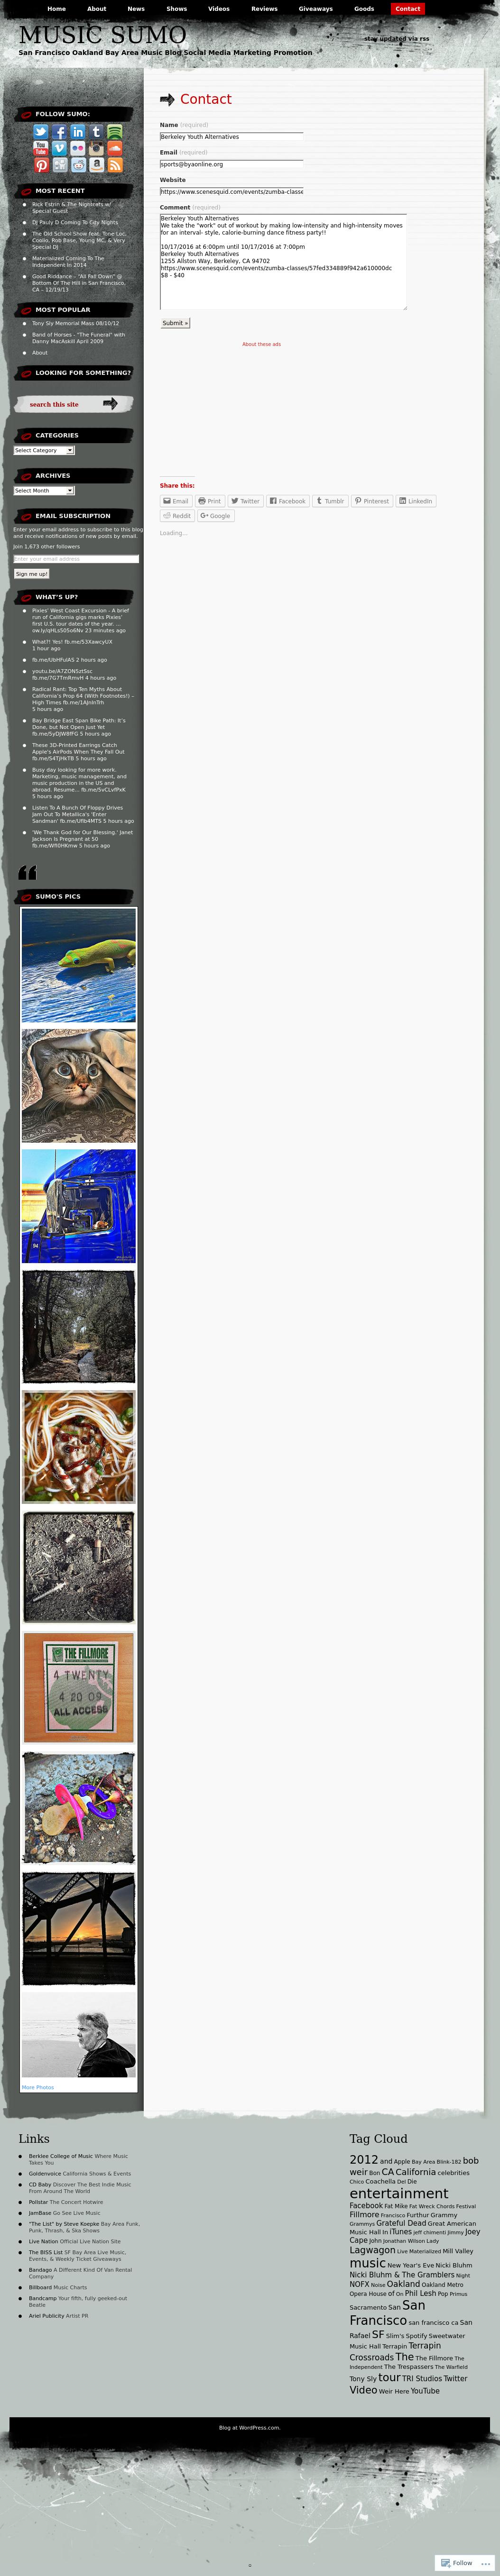 Screenshot from Music Sumo integration